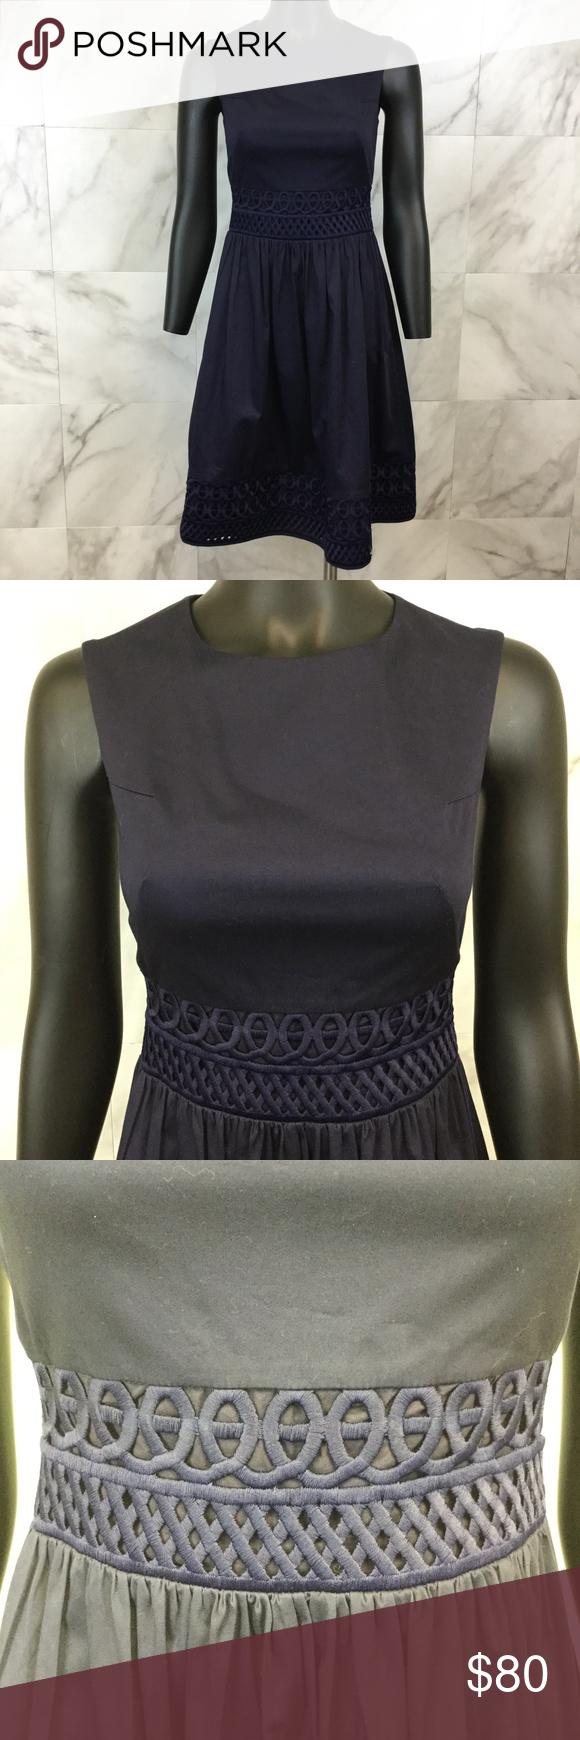 3af32b472ebf Ted Baker Dayzey Lace Panel Dress - size 2 Ted Baker Dayzey Lace Panel Dress  in